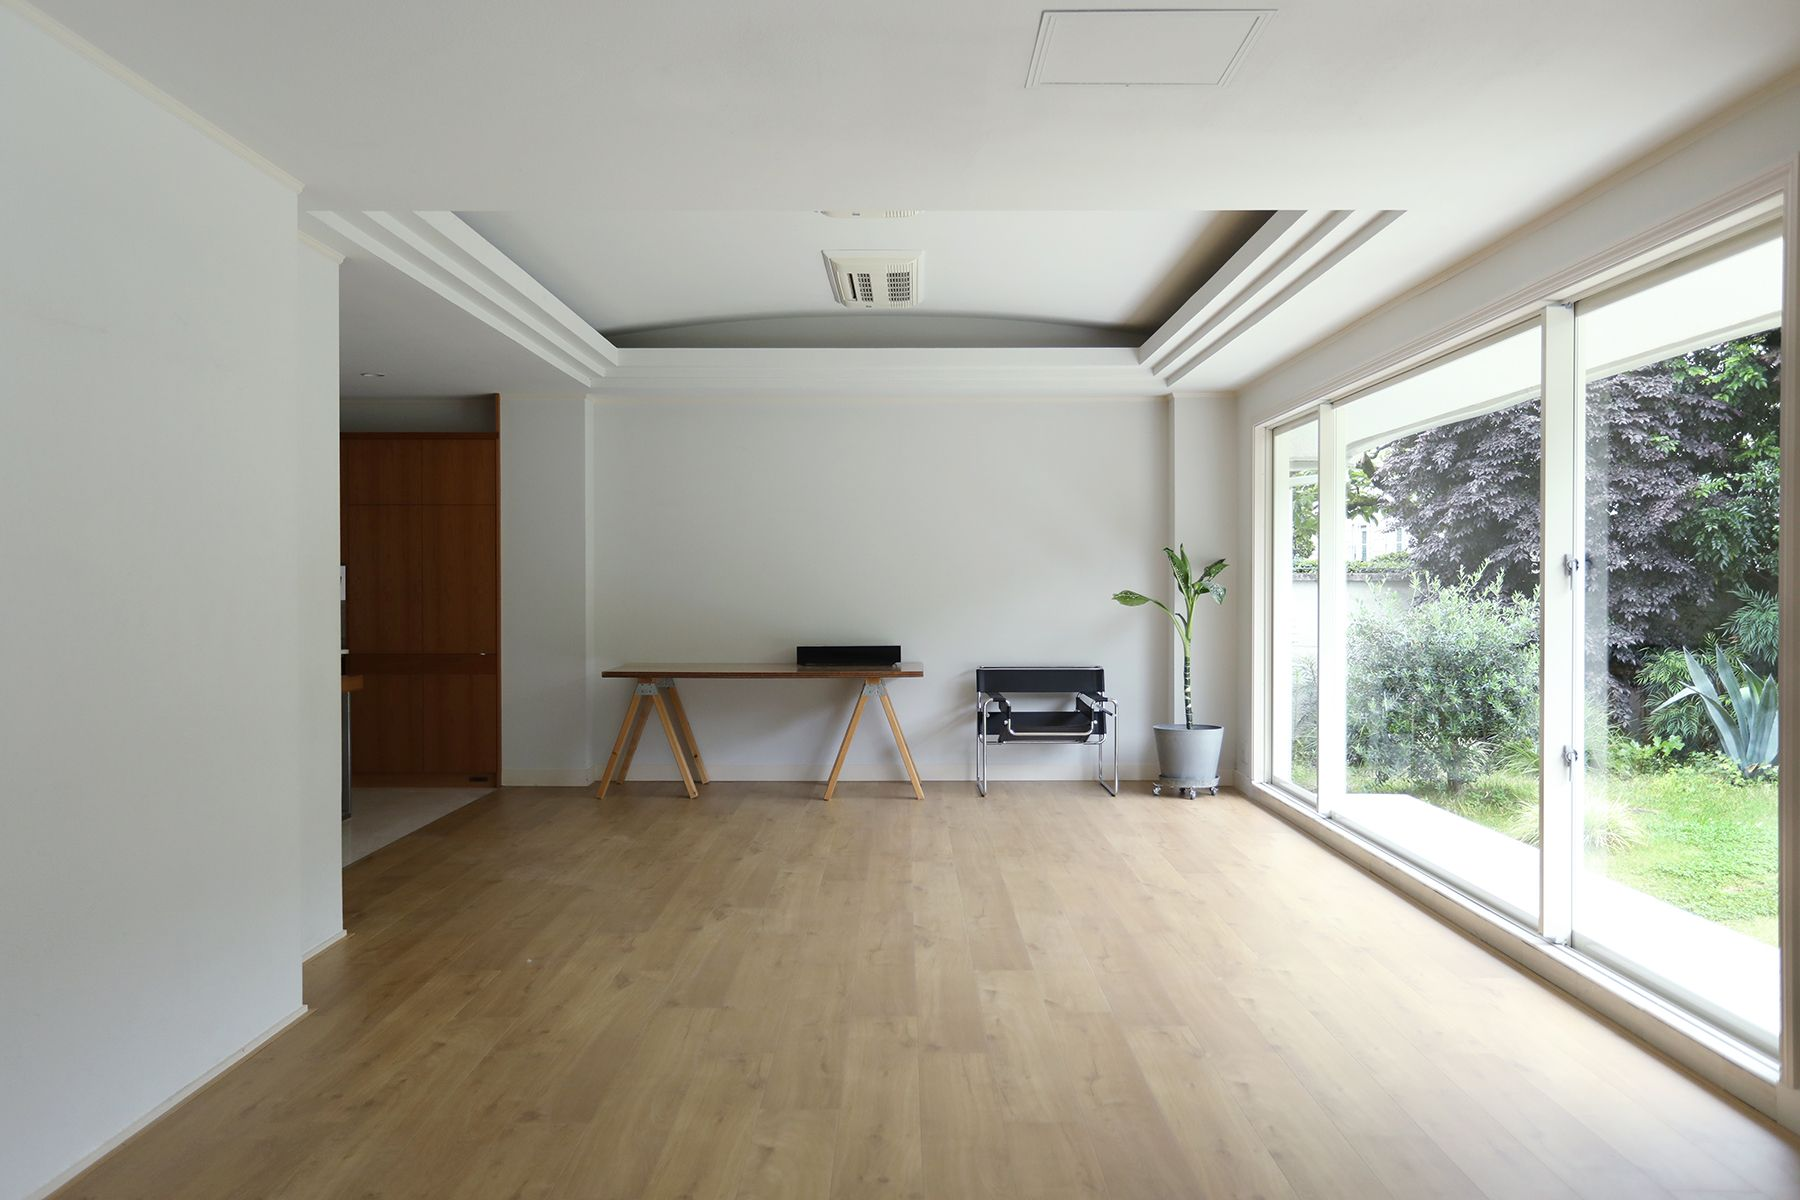 SHILO STUDIO MEGURO (シロスタジオ メグロ)1F 庭